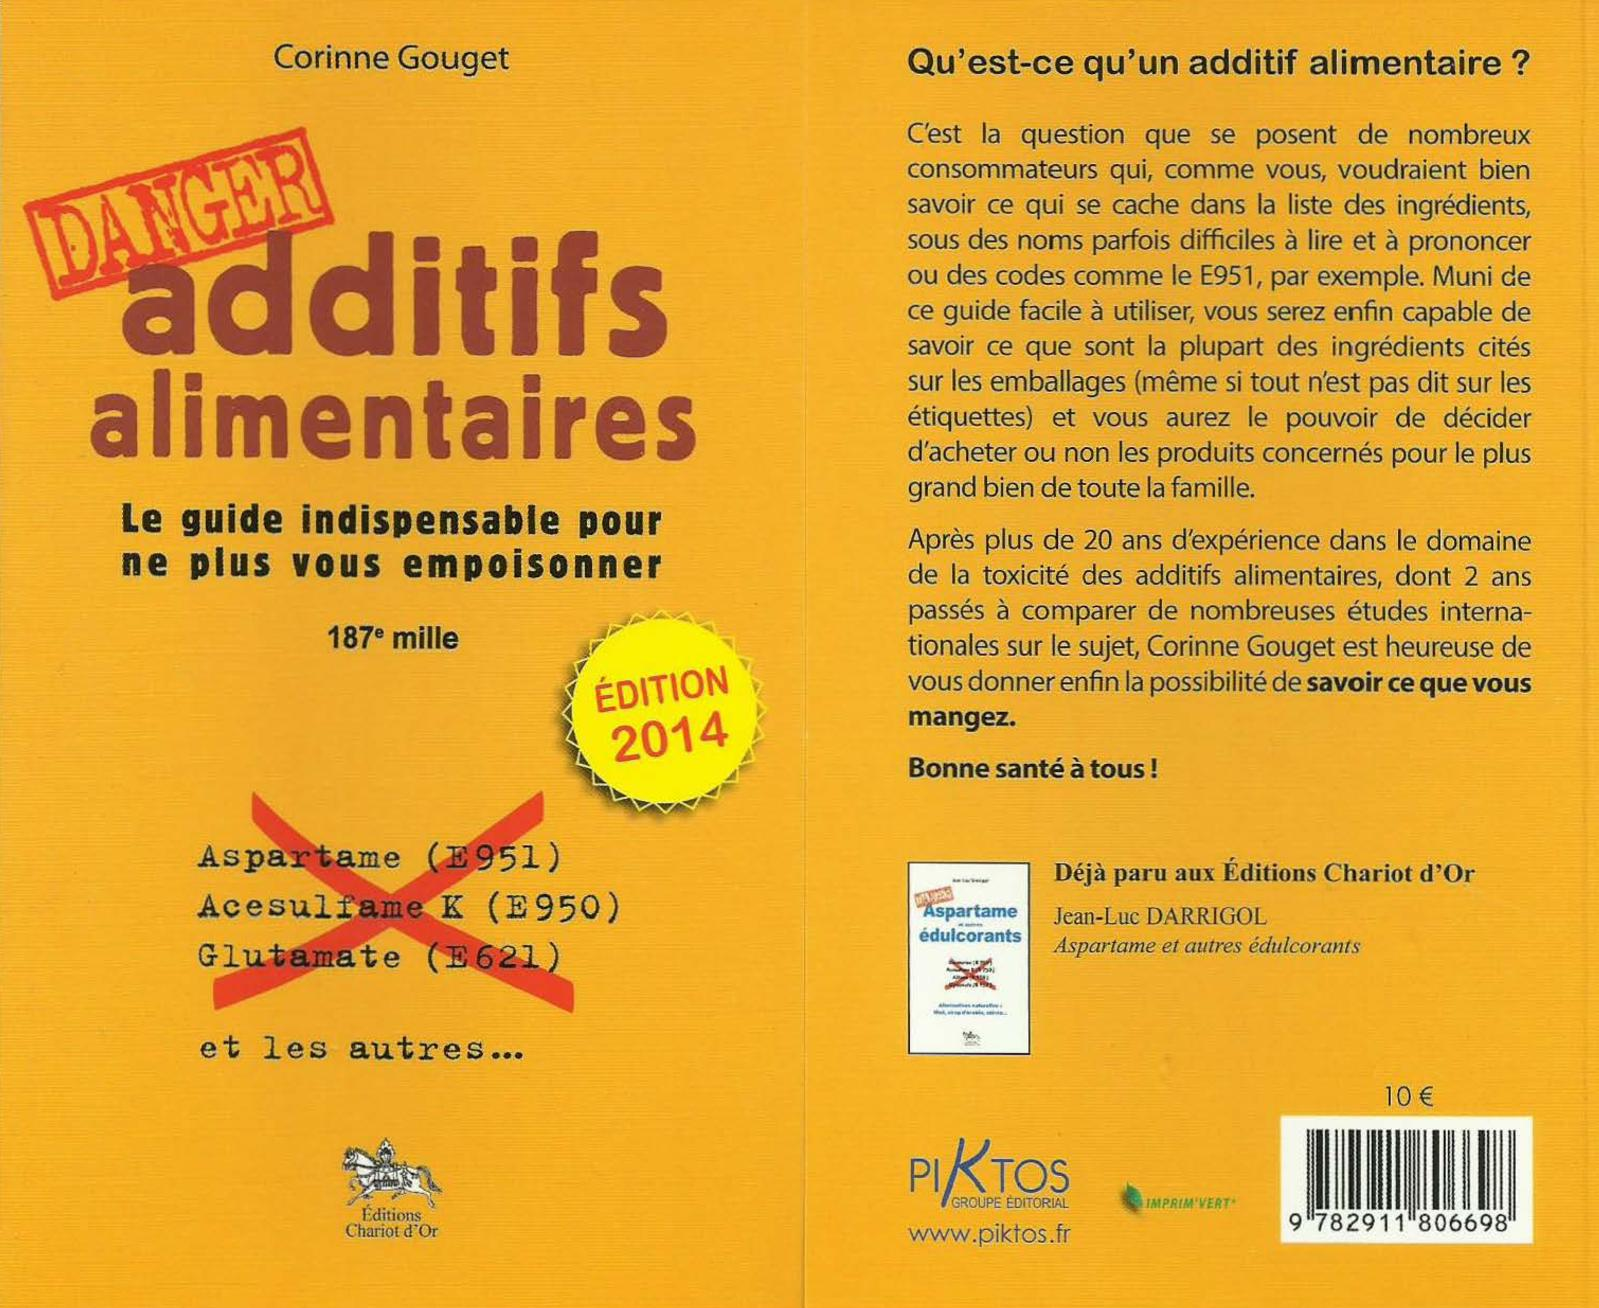 Corinne Gouget - Additifs alimentaires Danger 2014